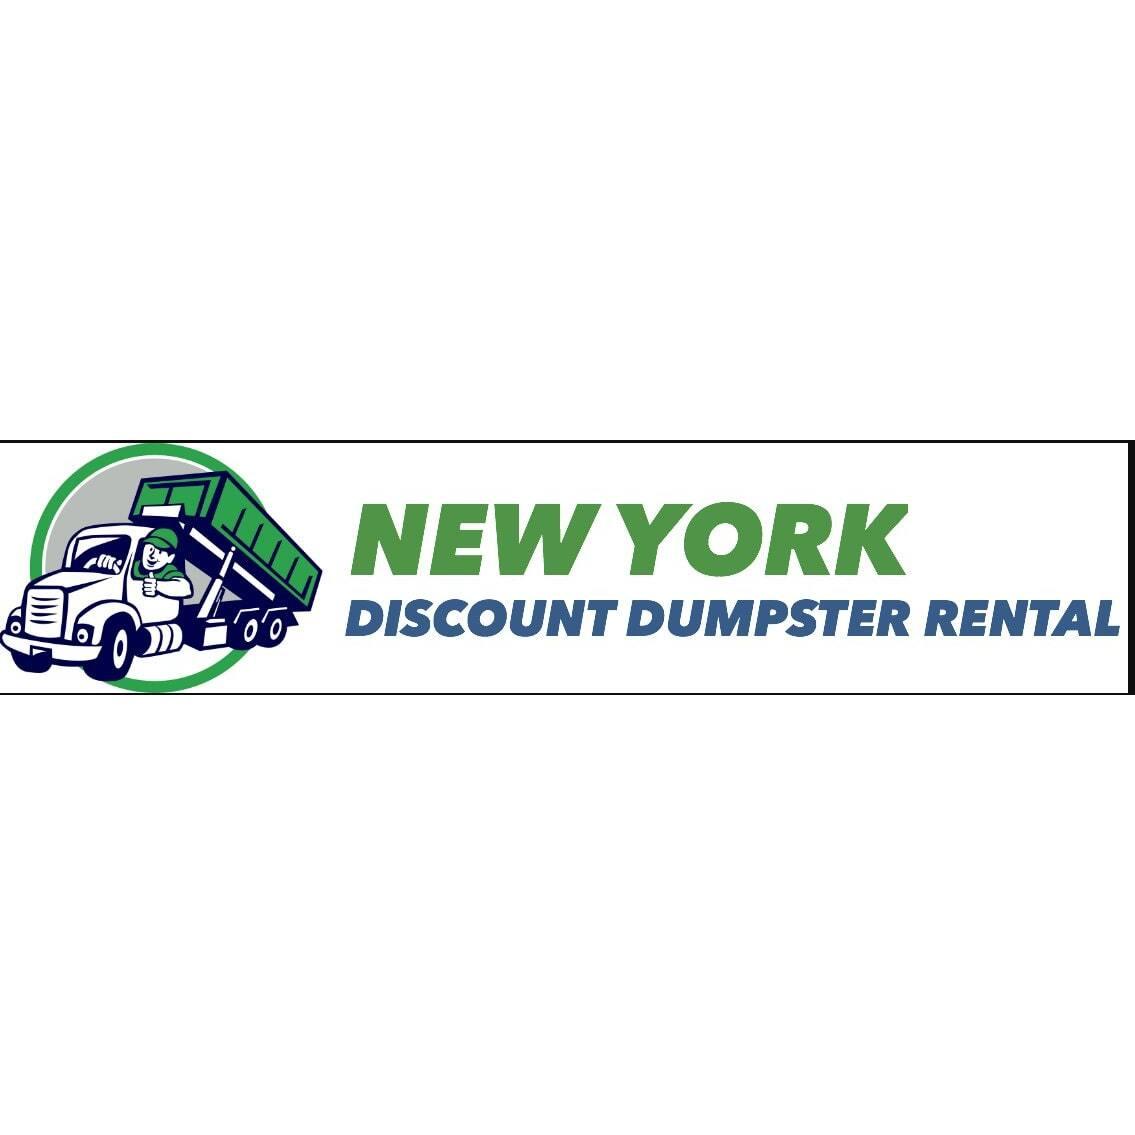 Discount Dumpster Rental New York